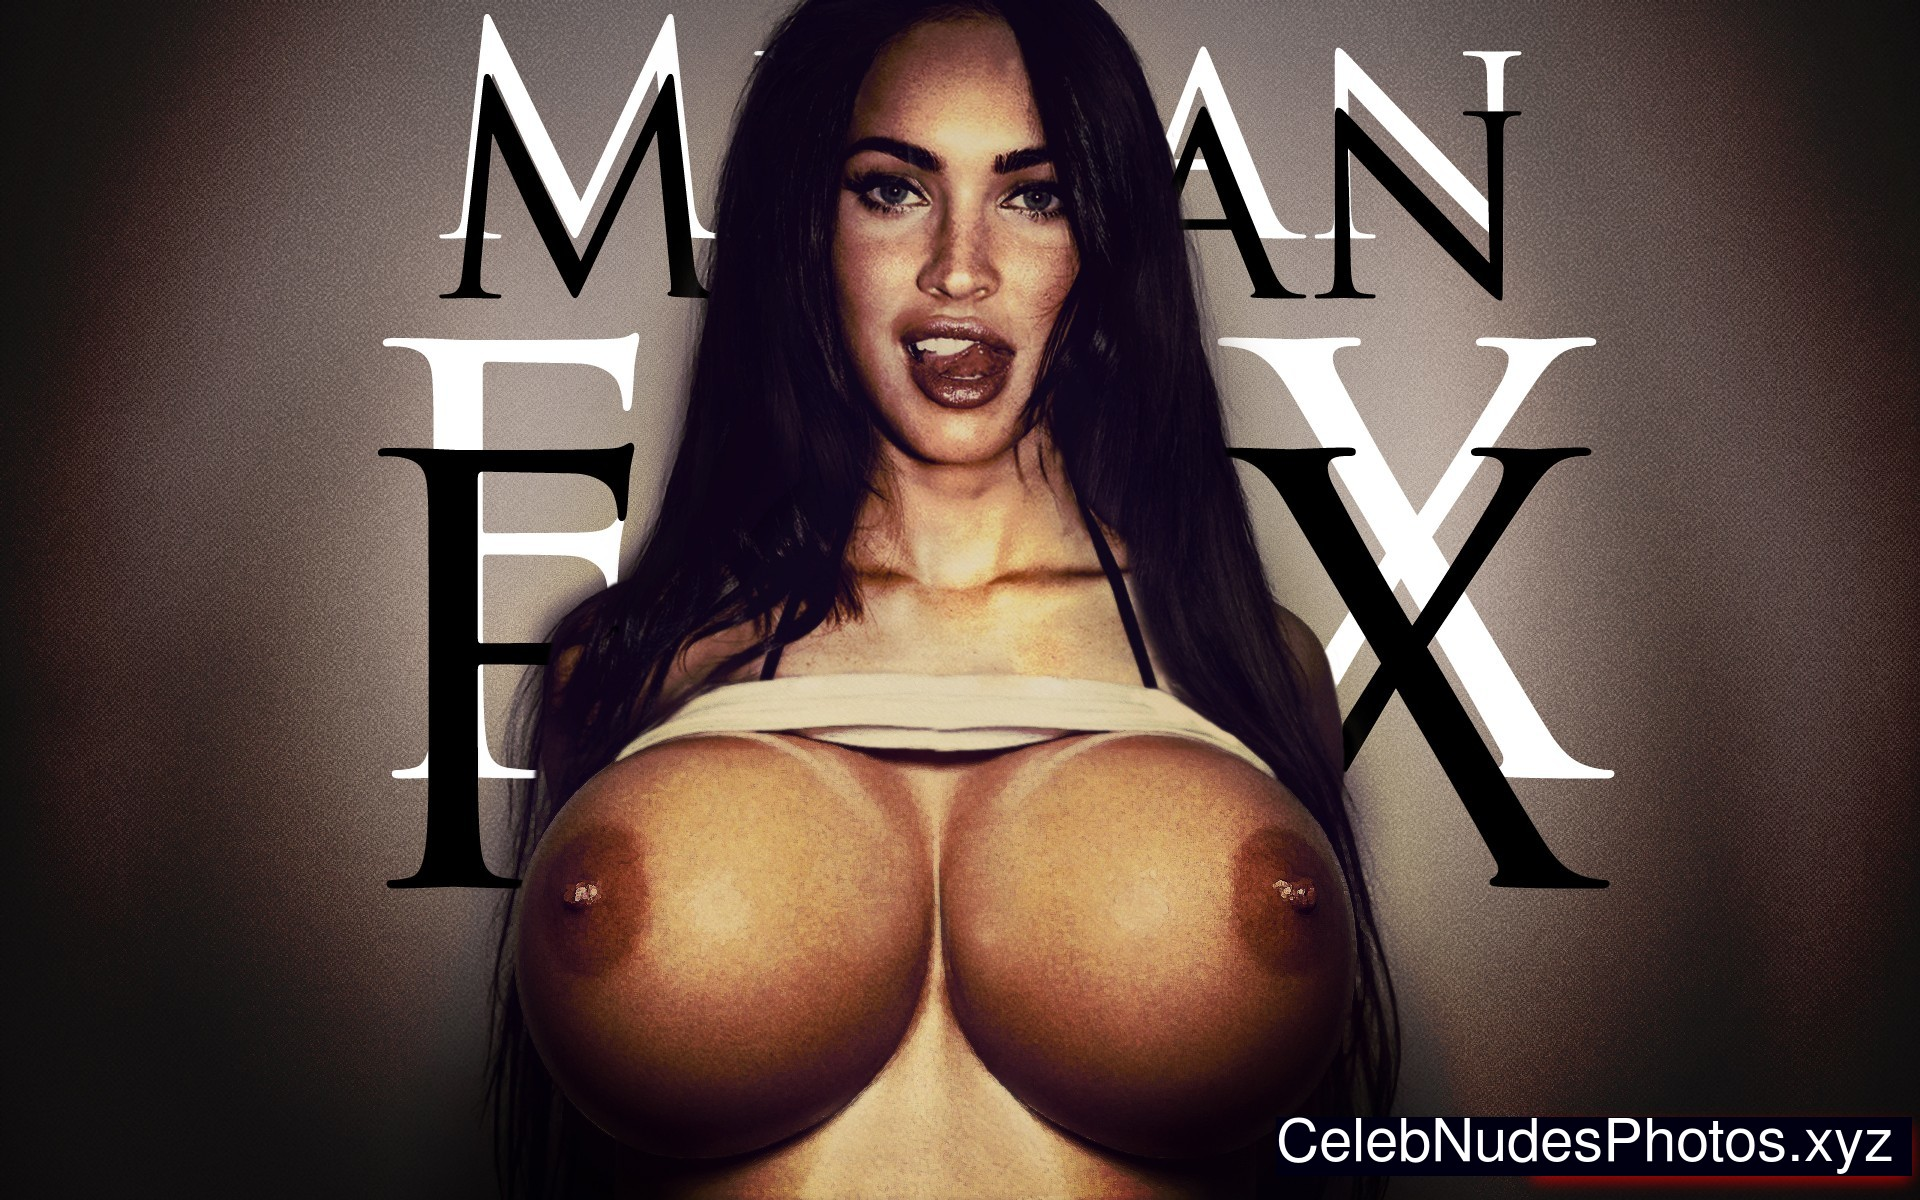 Megan Fox Newest Celebrity Nude sexy 2